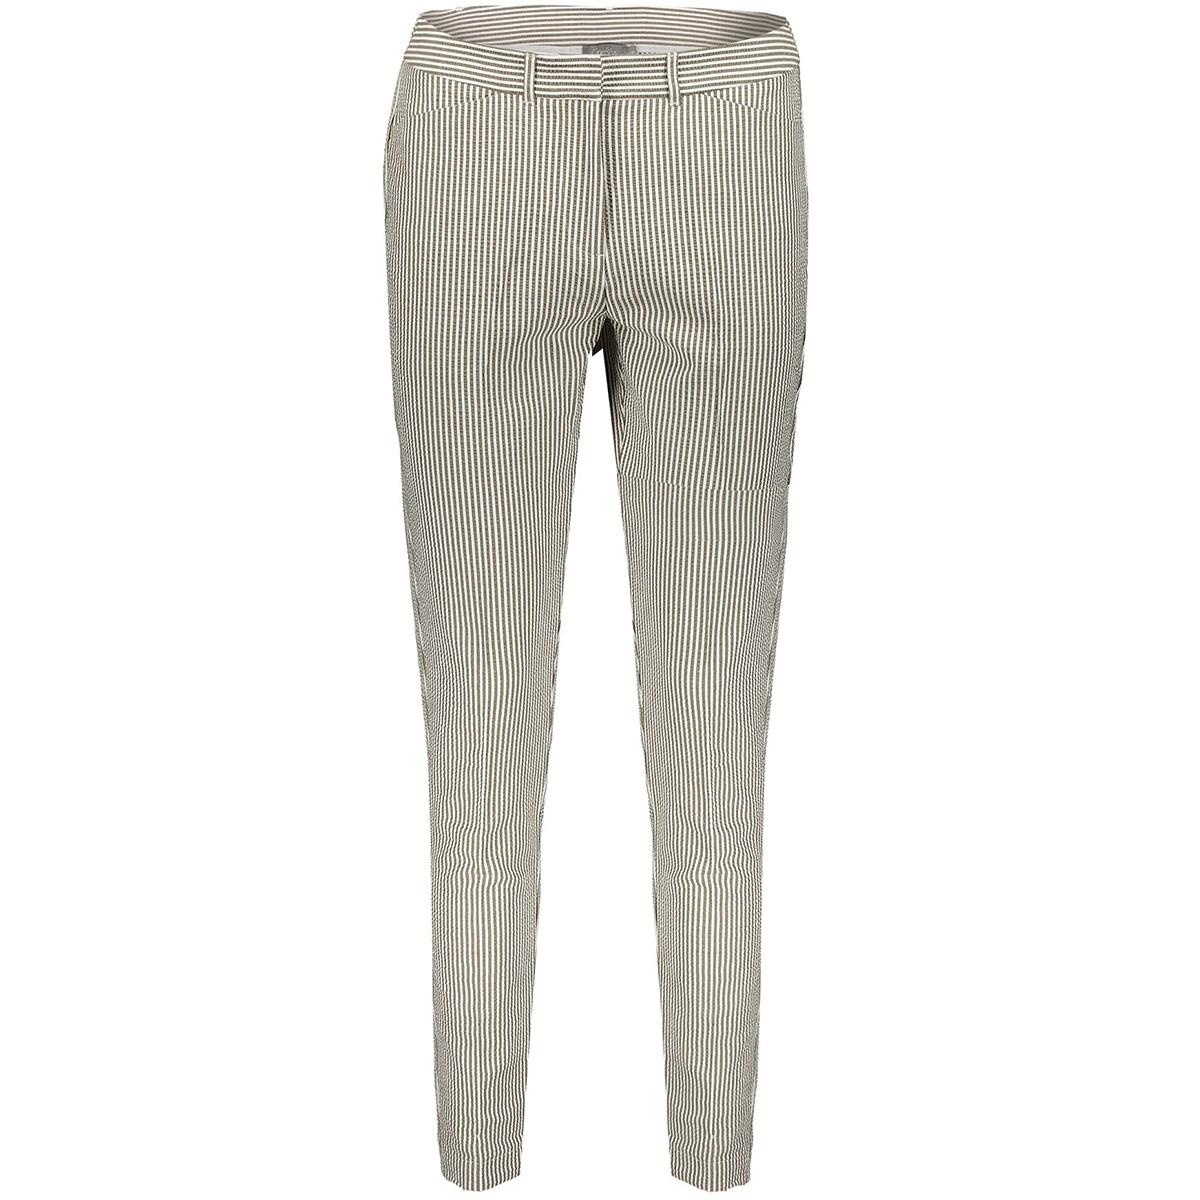 pants seersucker 01096 geisha broek sand/white